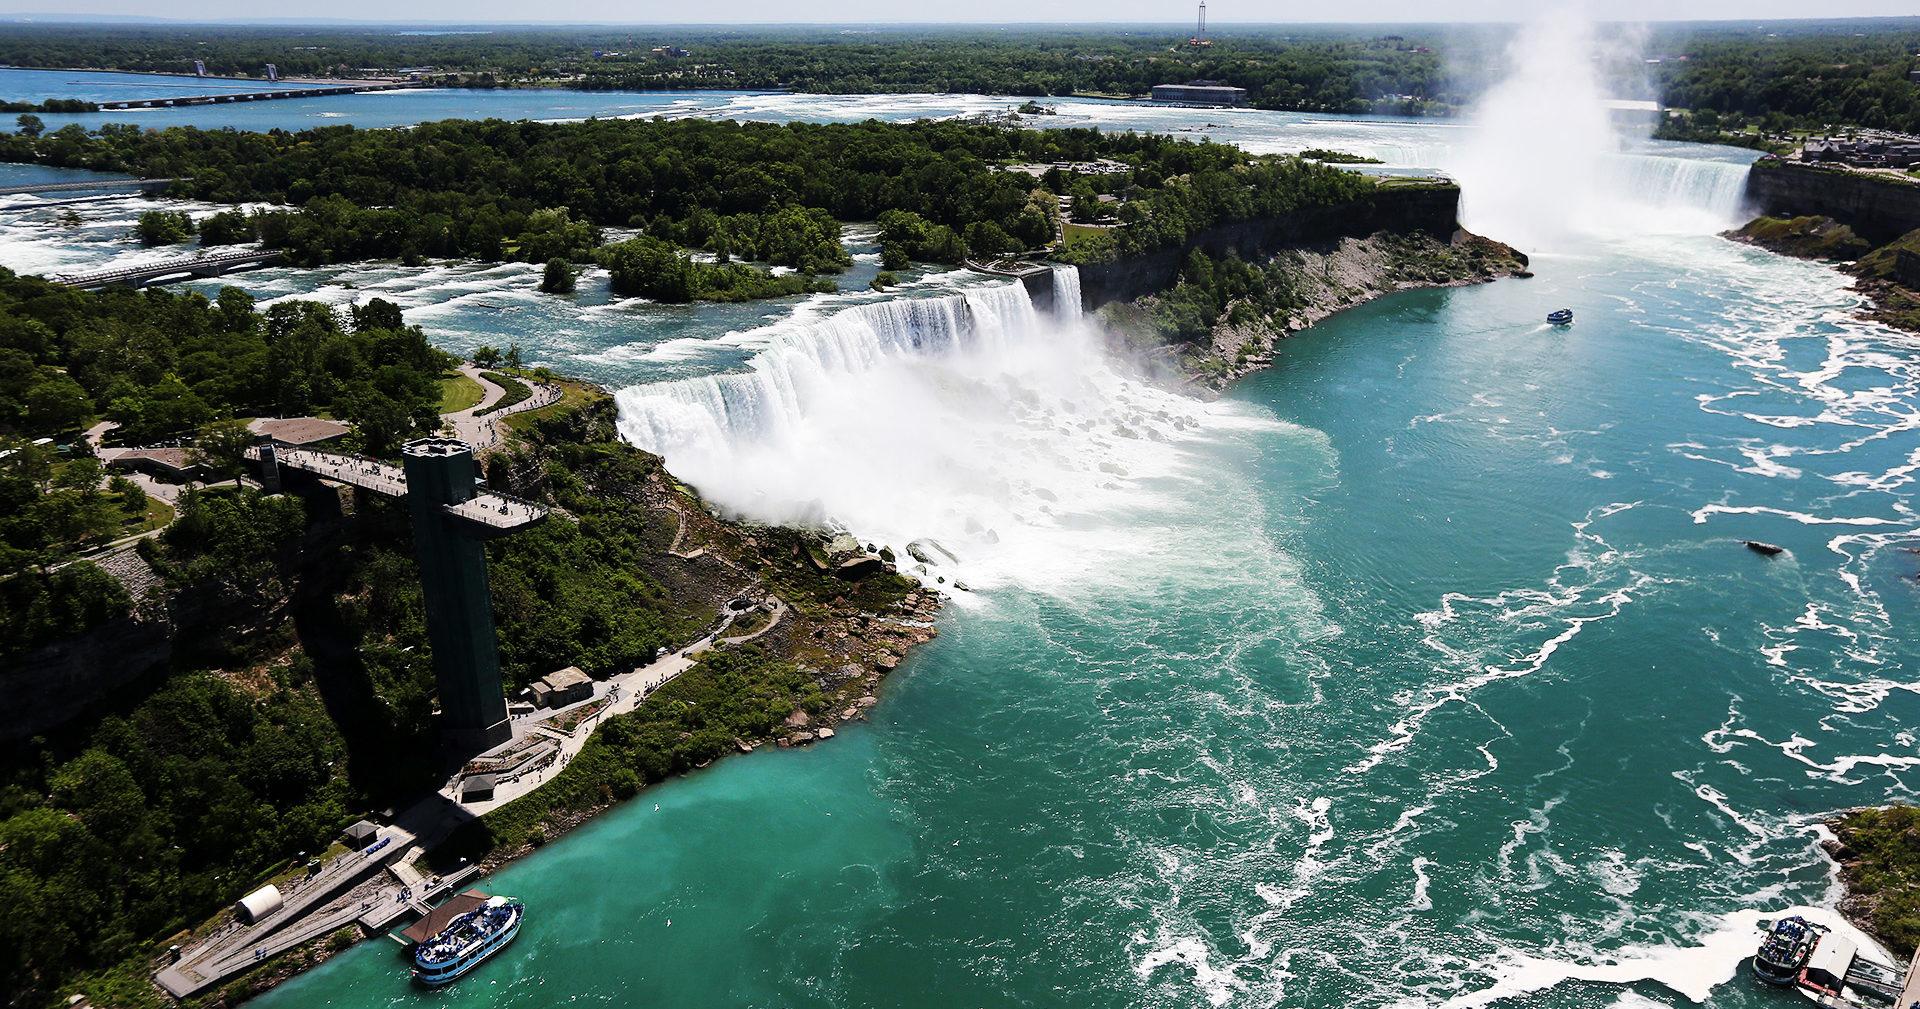 Niagara Falls Wallpapers High Quality Download Free